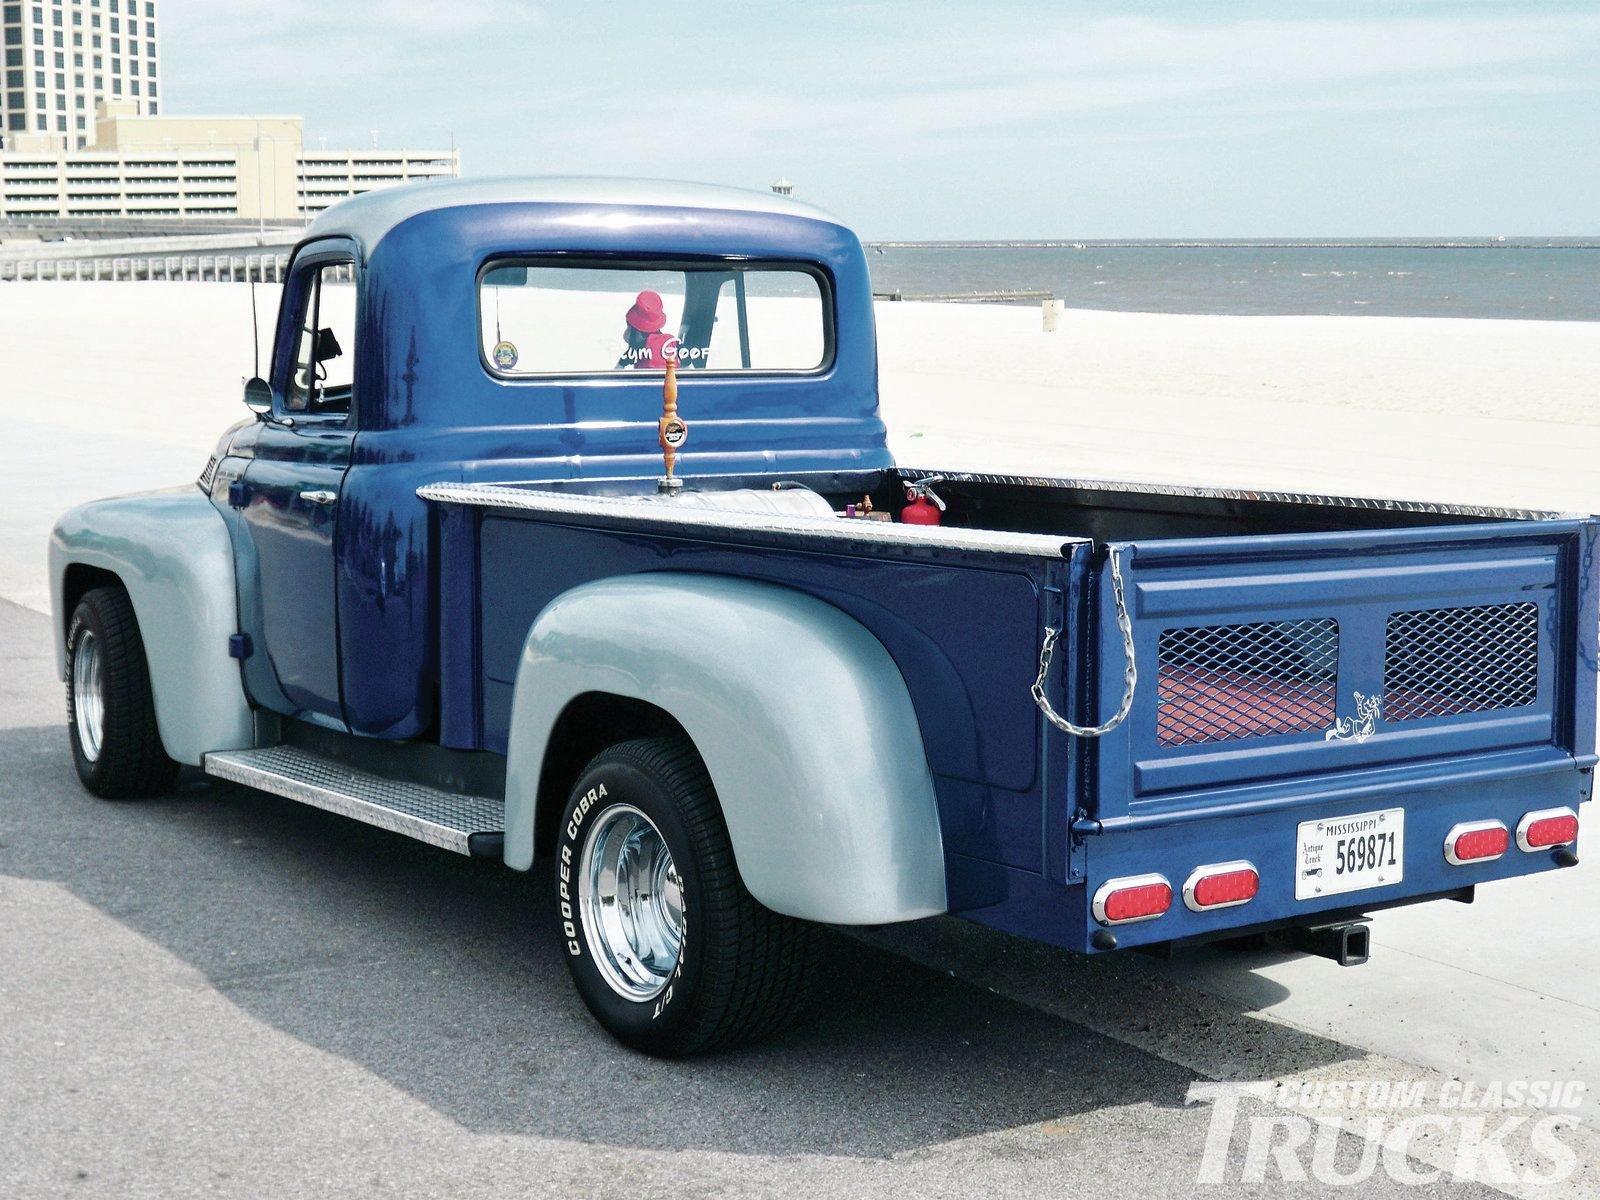 1955 International Harvester R Series Pickup Hotrod Streetrod Hot Ford F100 Street Rod Blue Usa 1600x1200 04 Wallpaper 936676 Wallpaperup